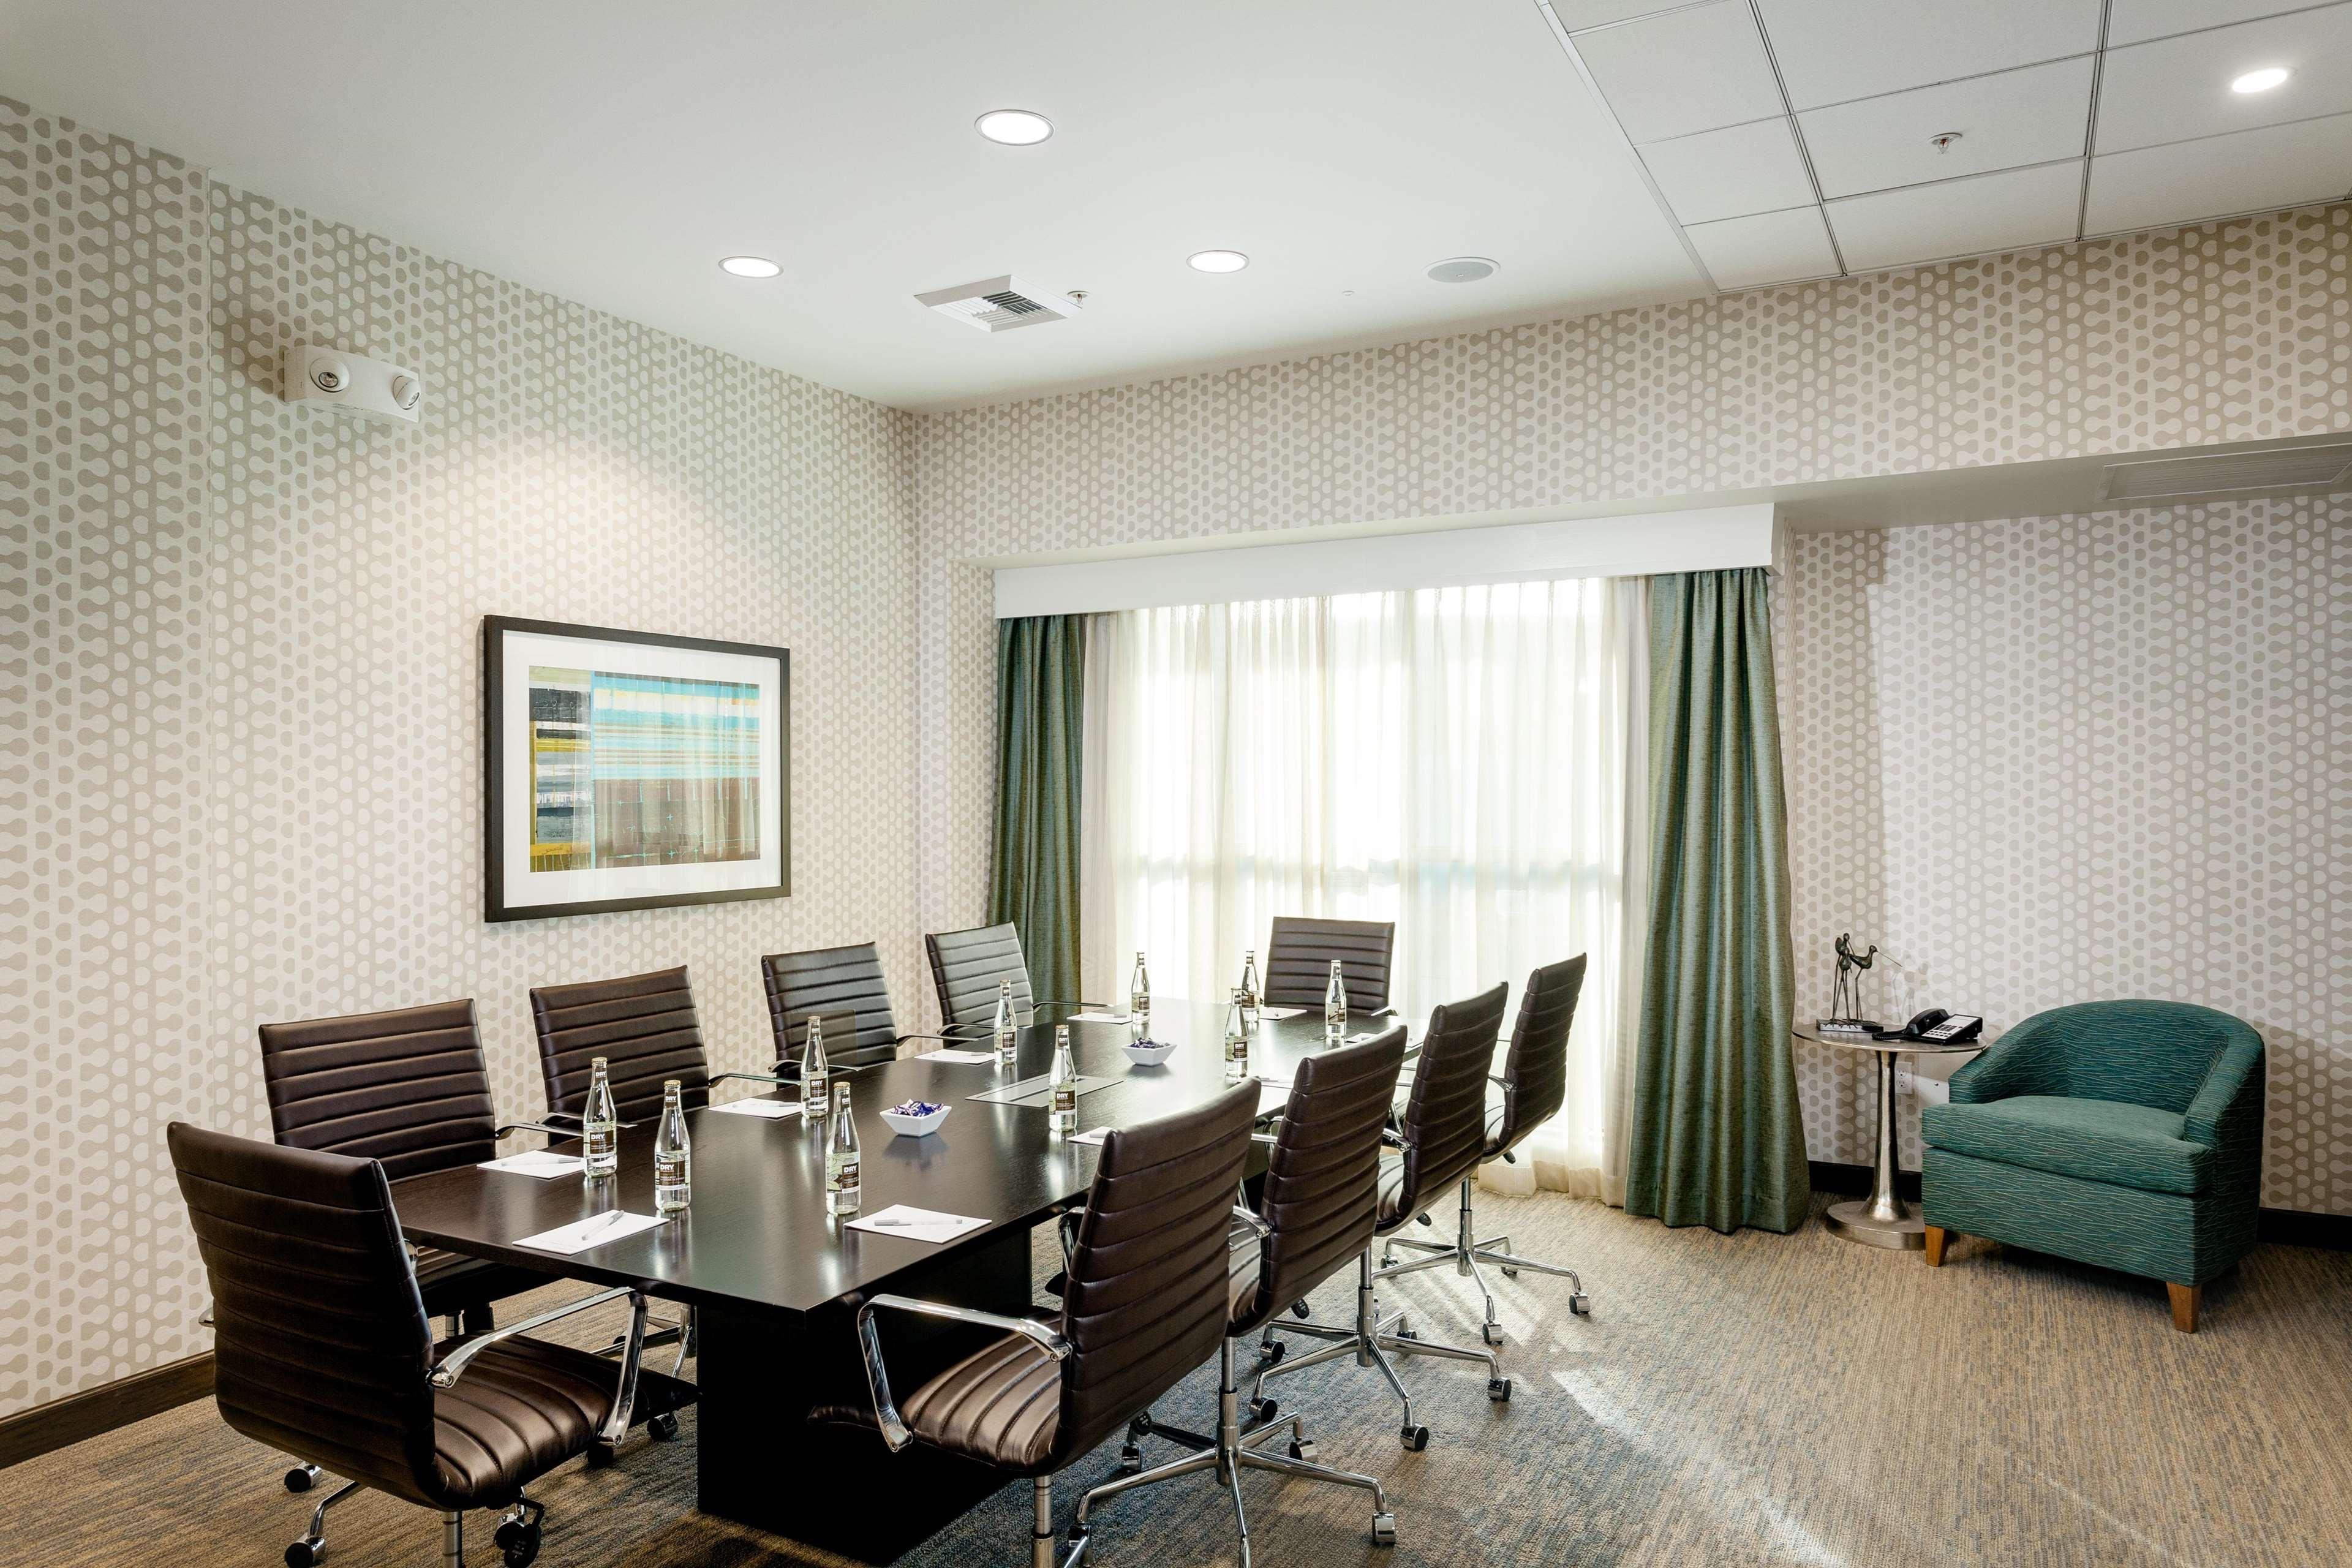 Hampton Inn & Suites by Hilton Seattle/Northgate image 35